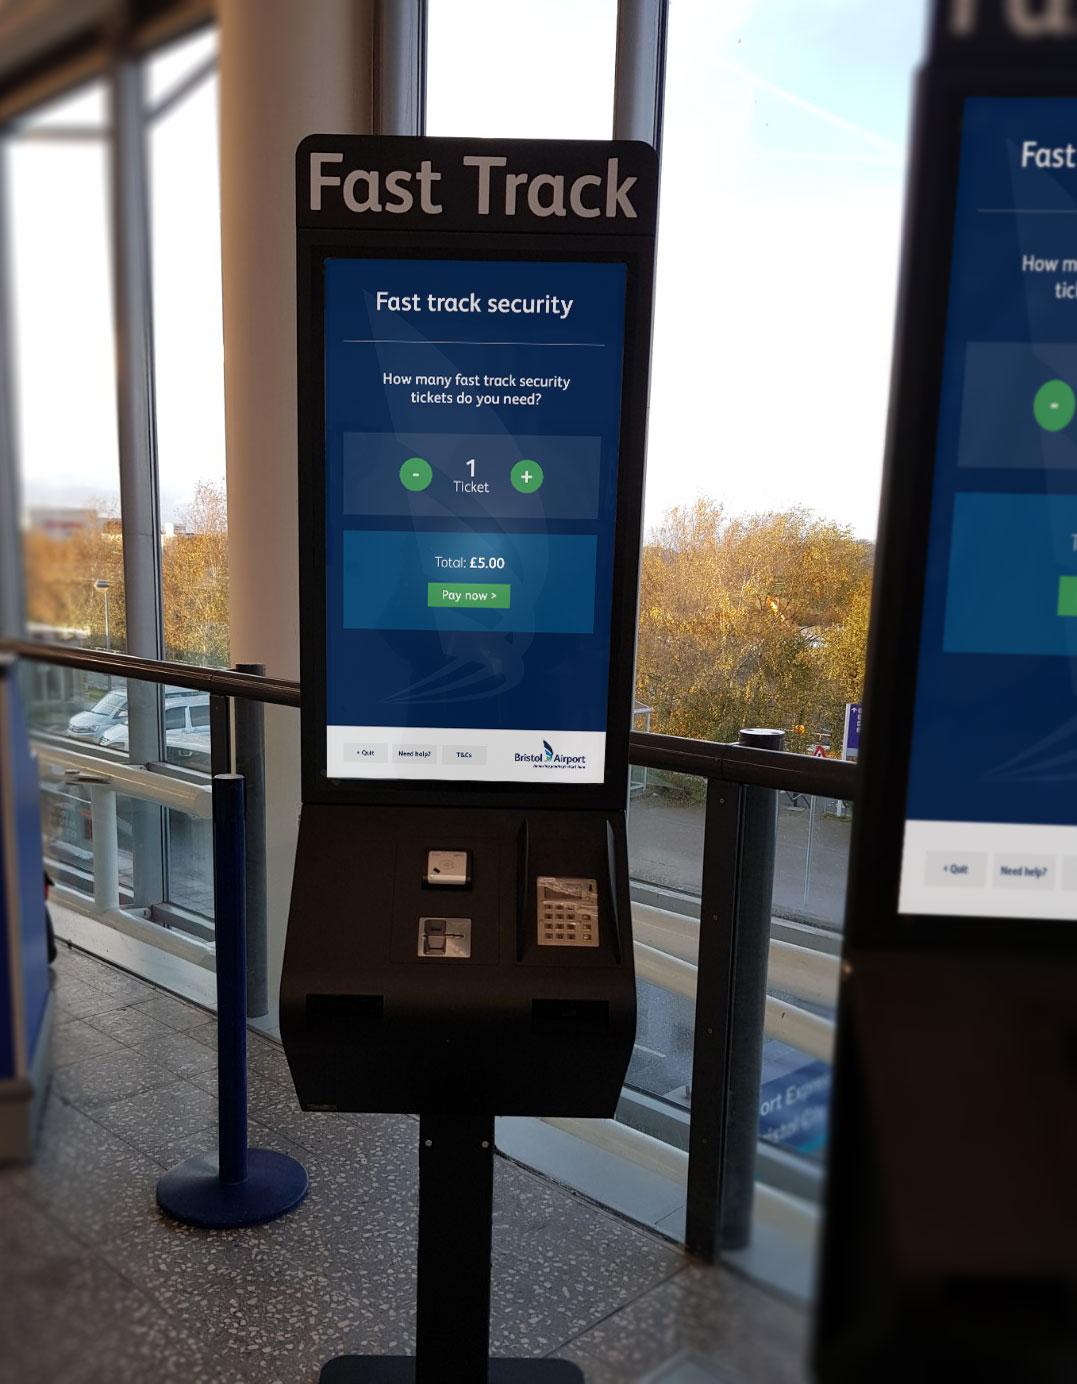 Bristol Airport Fast Track kiosk